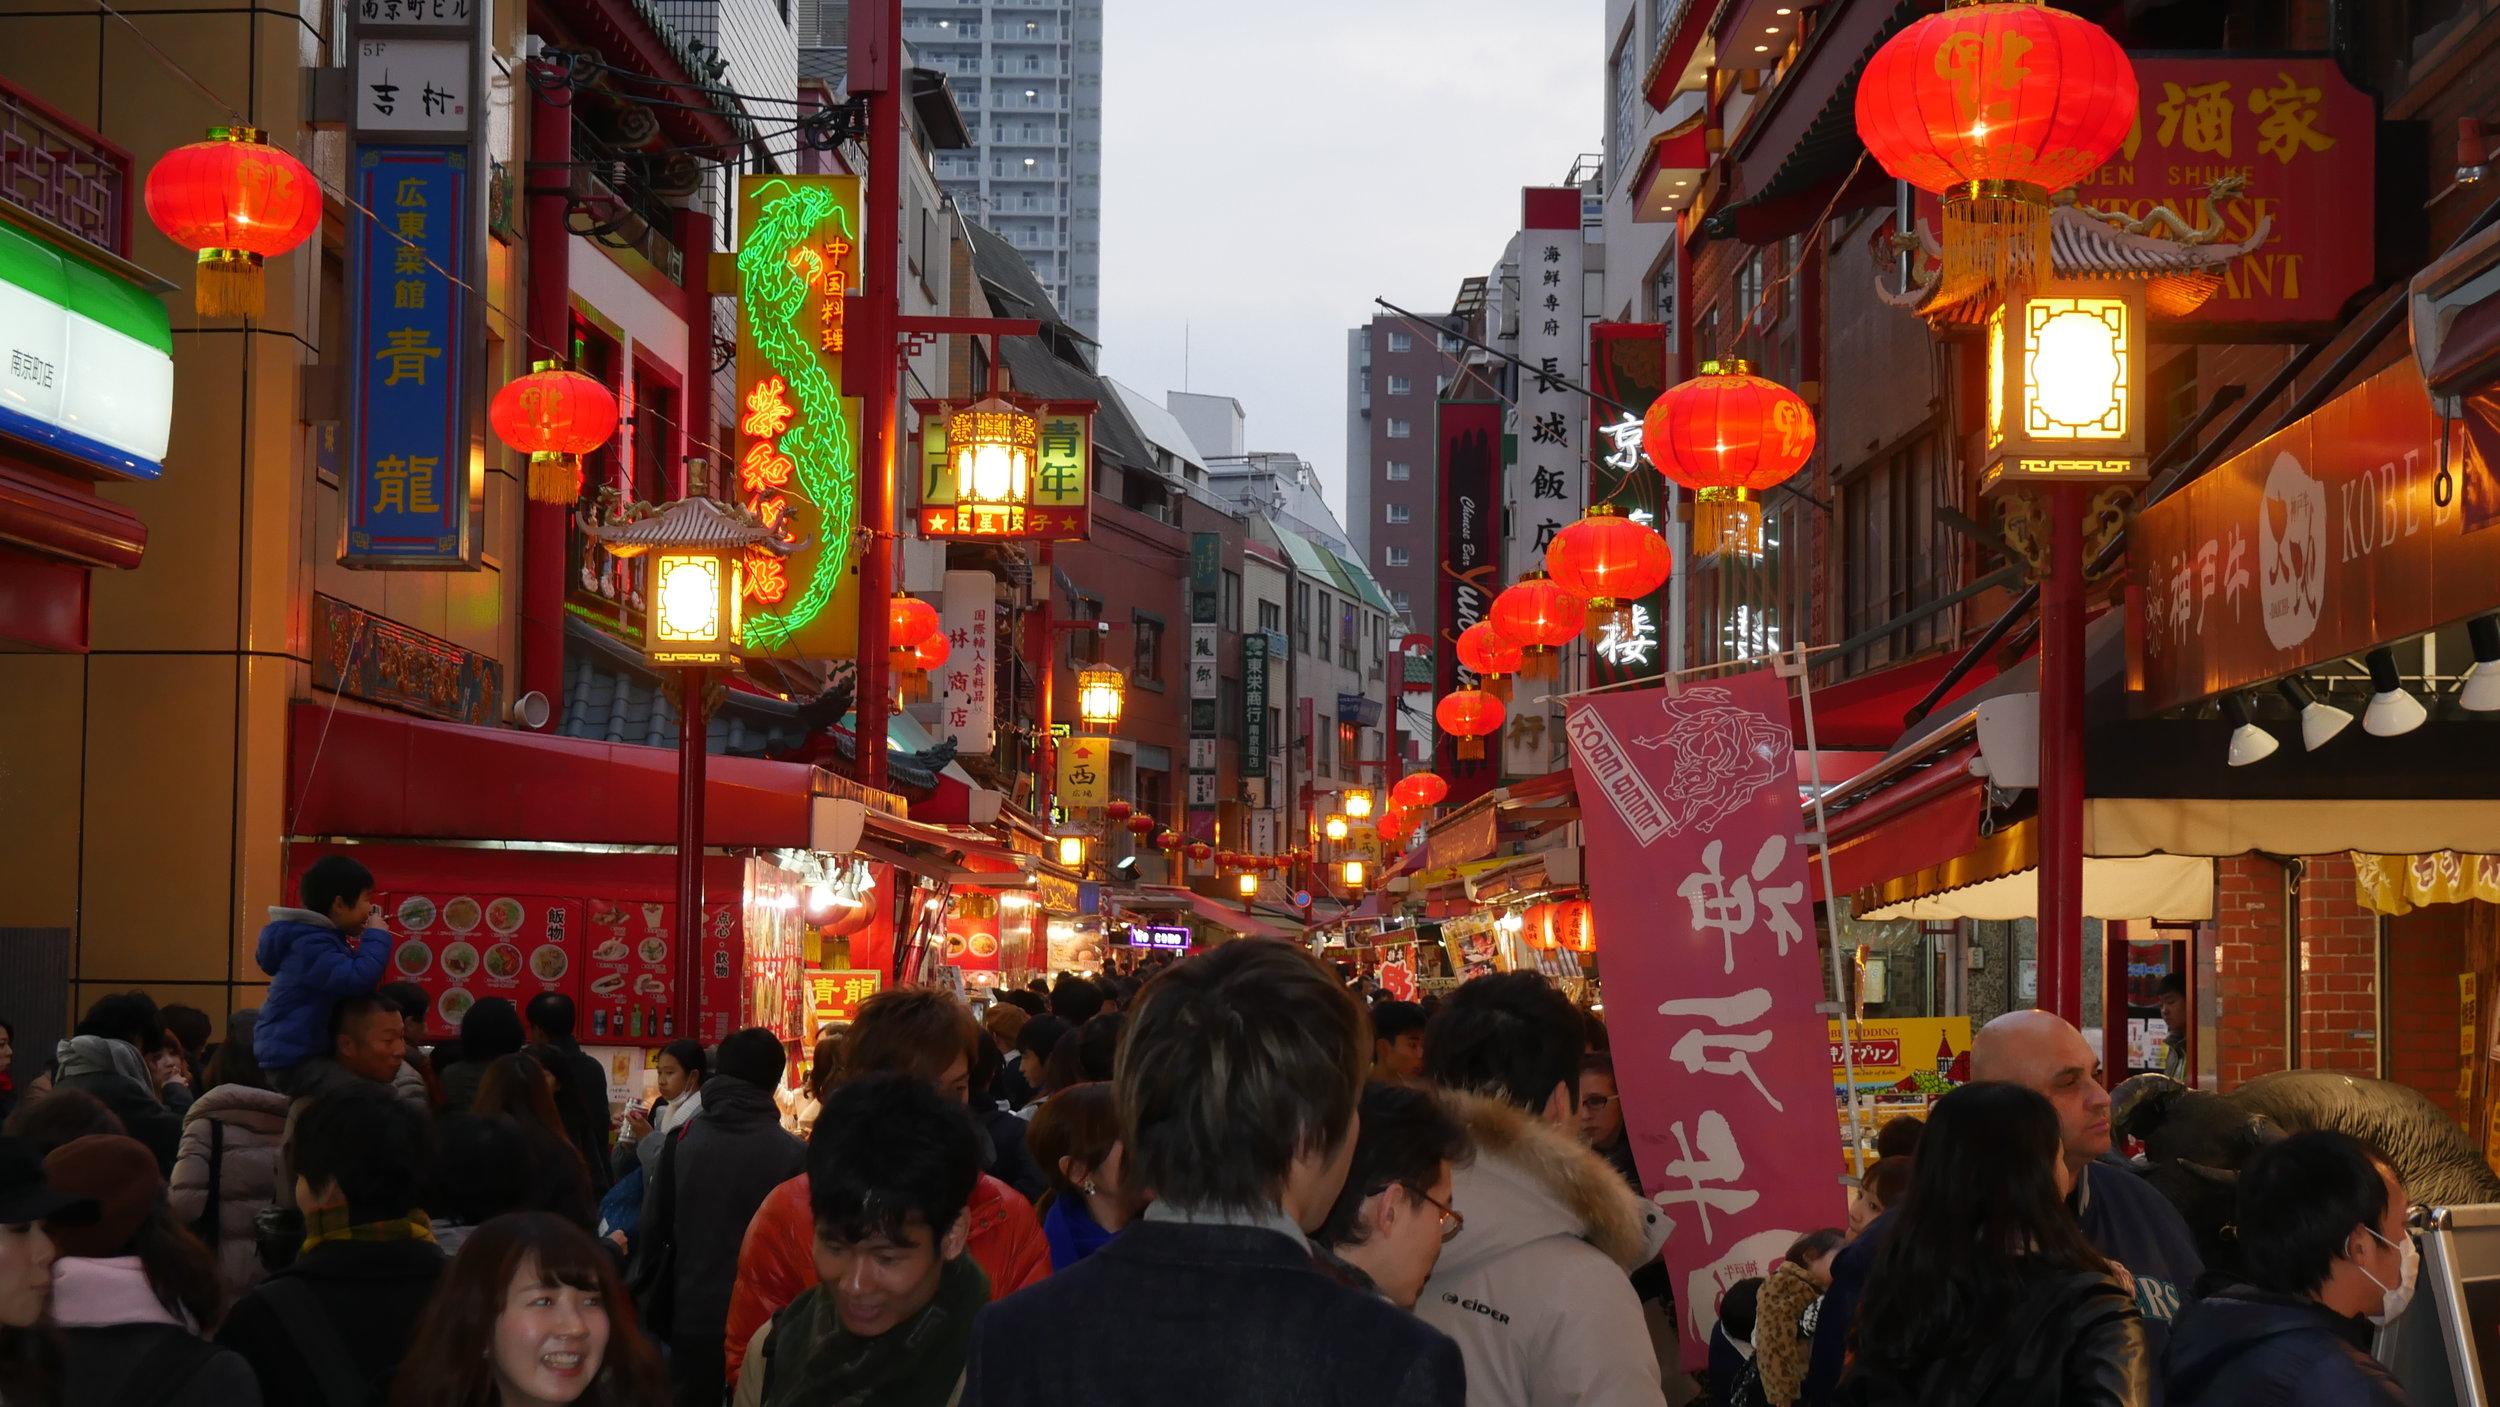 CHINA TOWN -